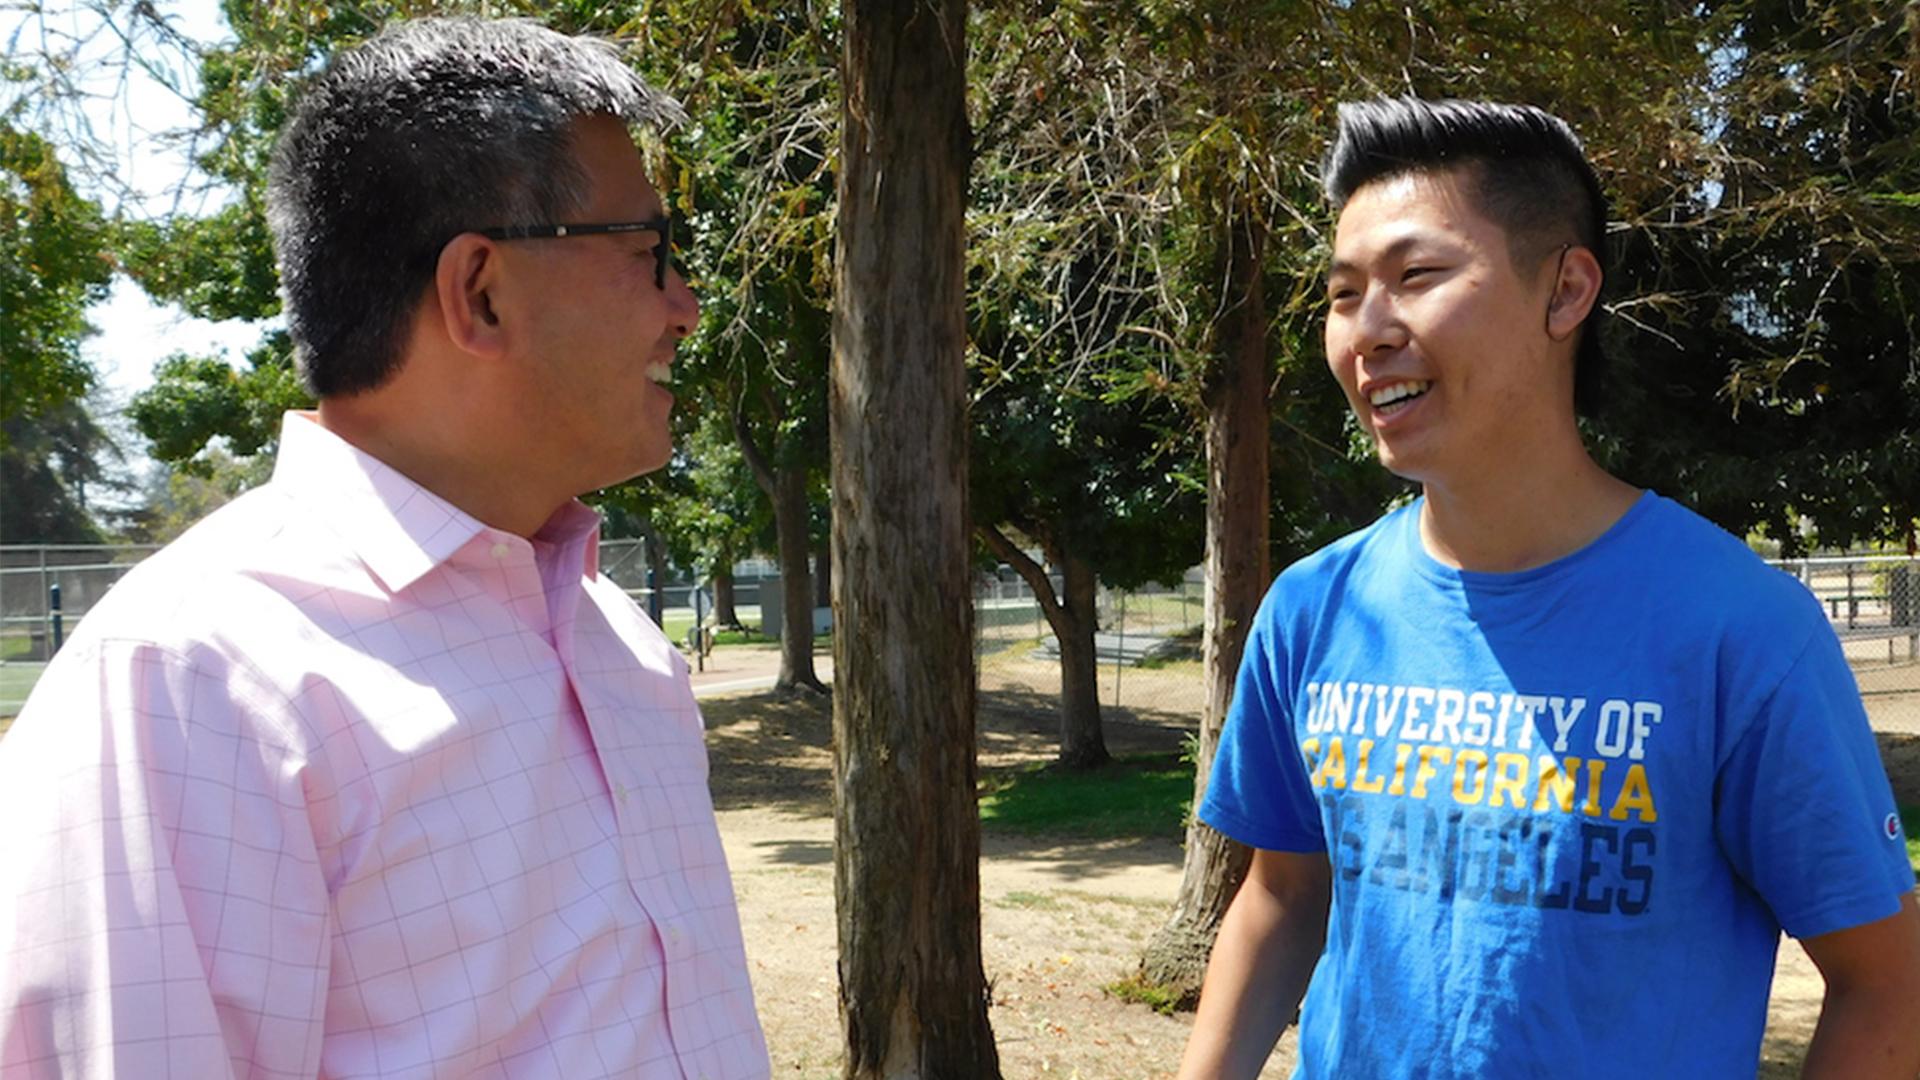 California State Treasurer John Chiang - Aug. 13, 2017